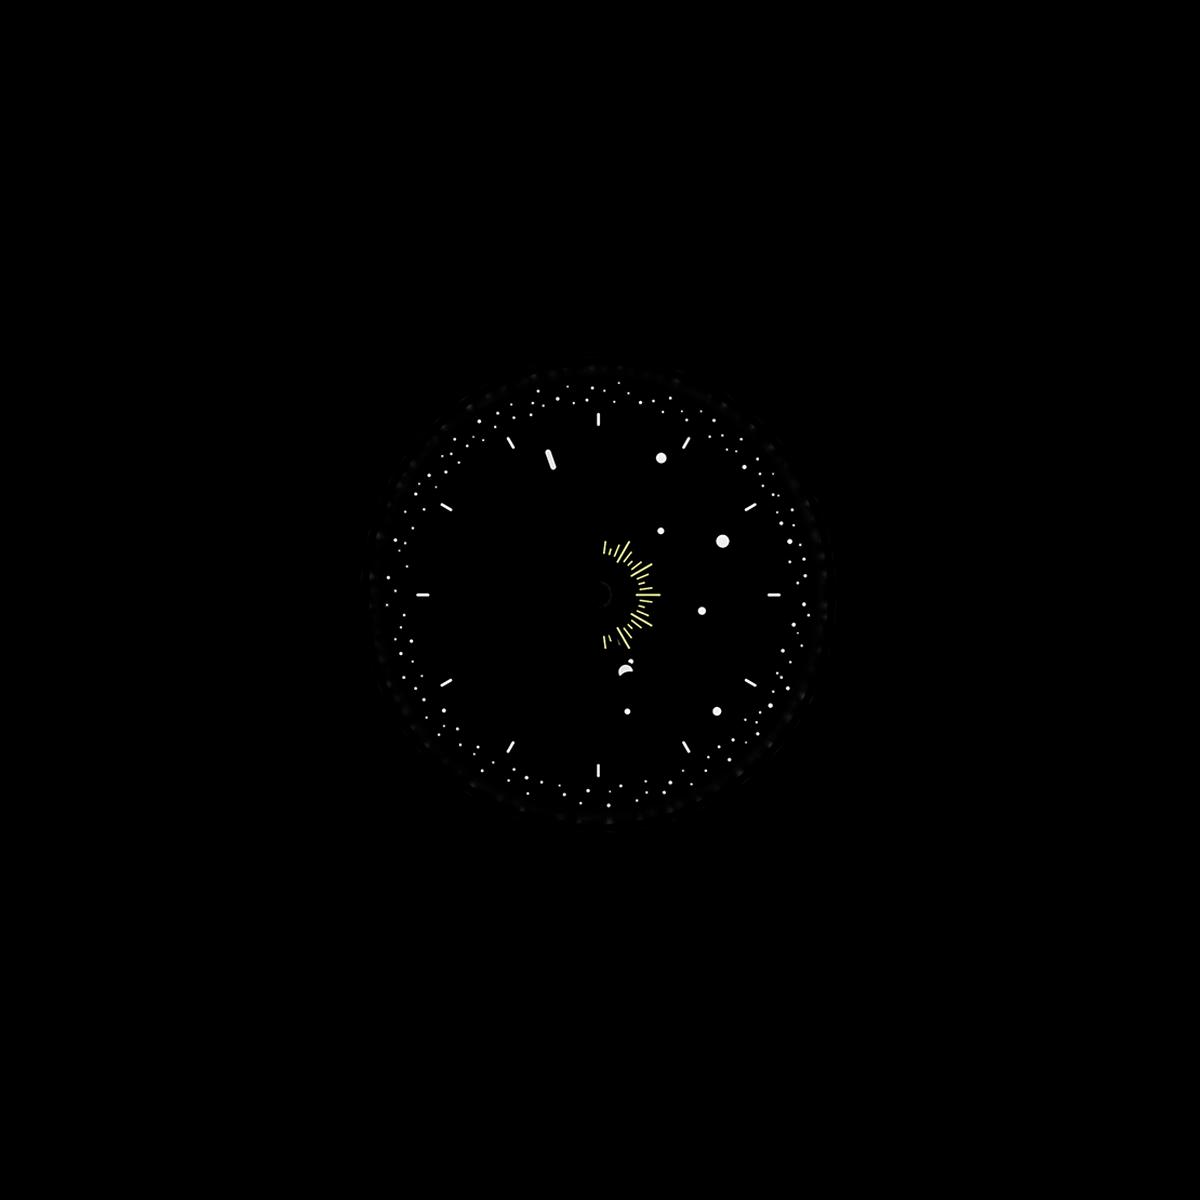 UNIVERSUM DEEP BLACK